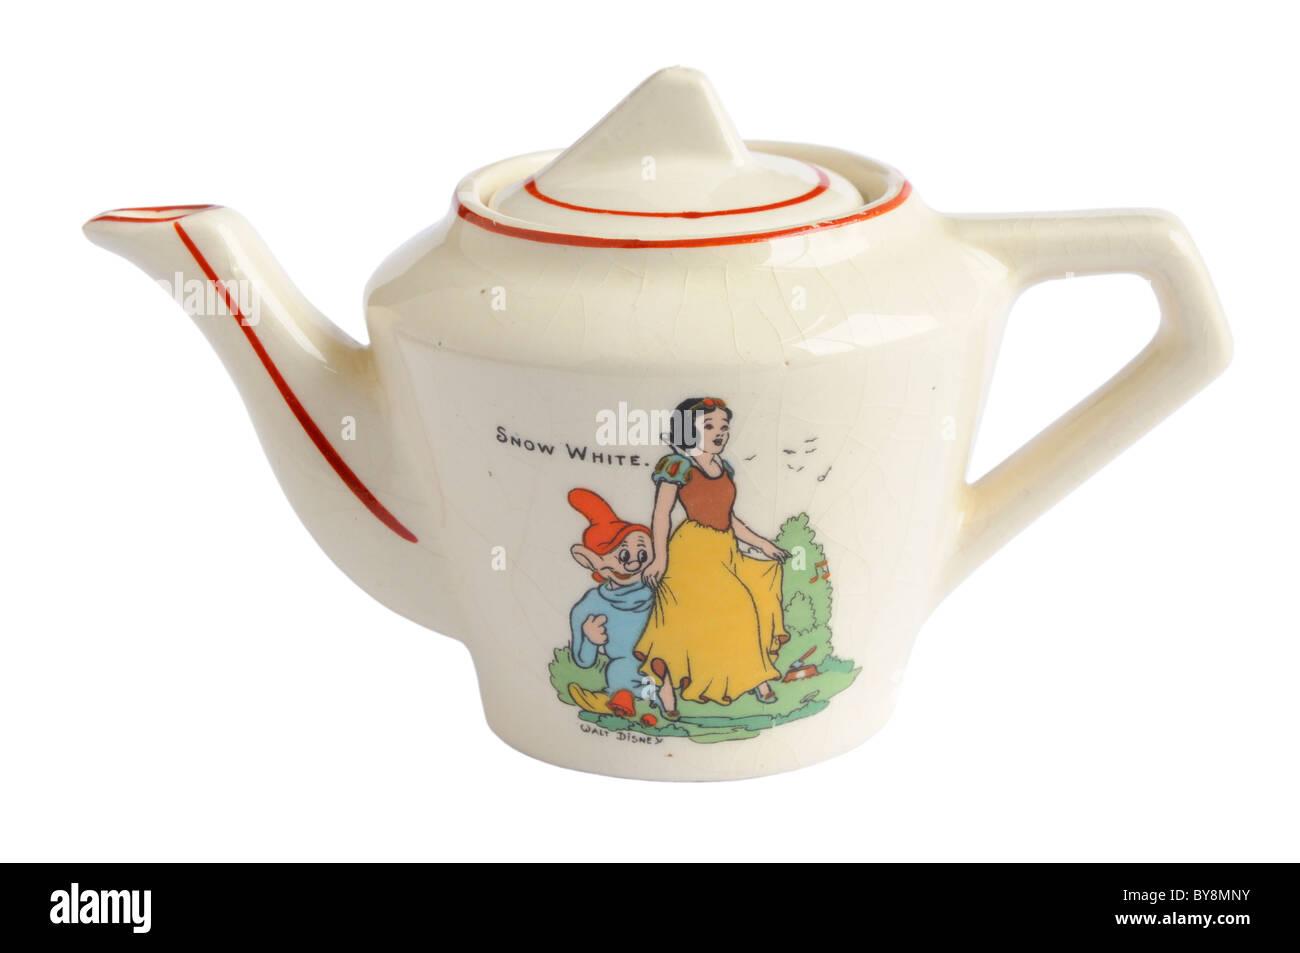 A 1930's Snow White doll's tea pot - Stock Image